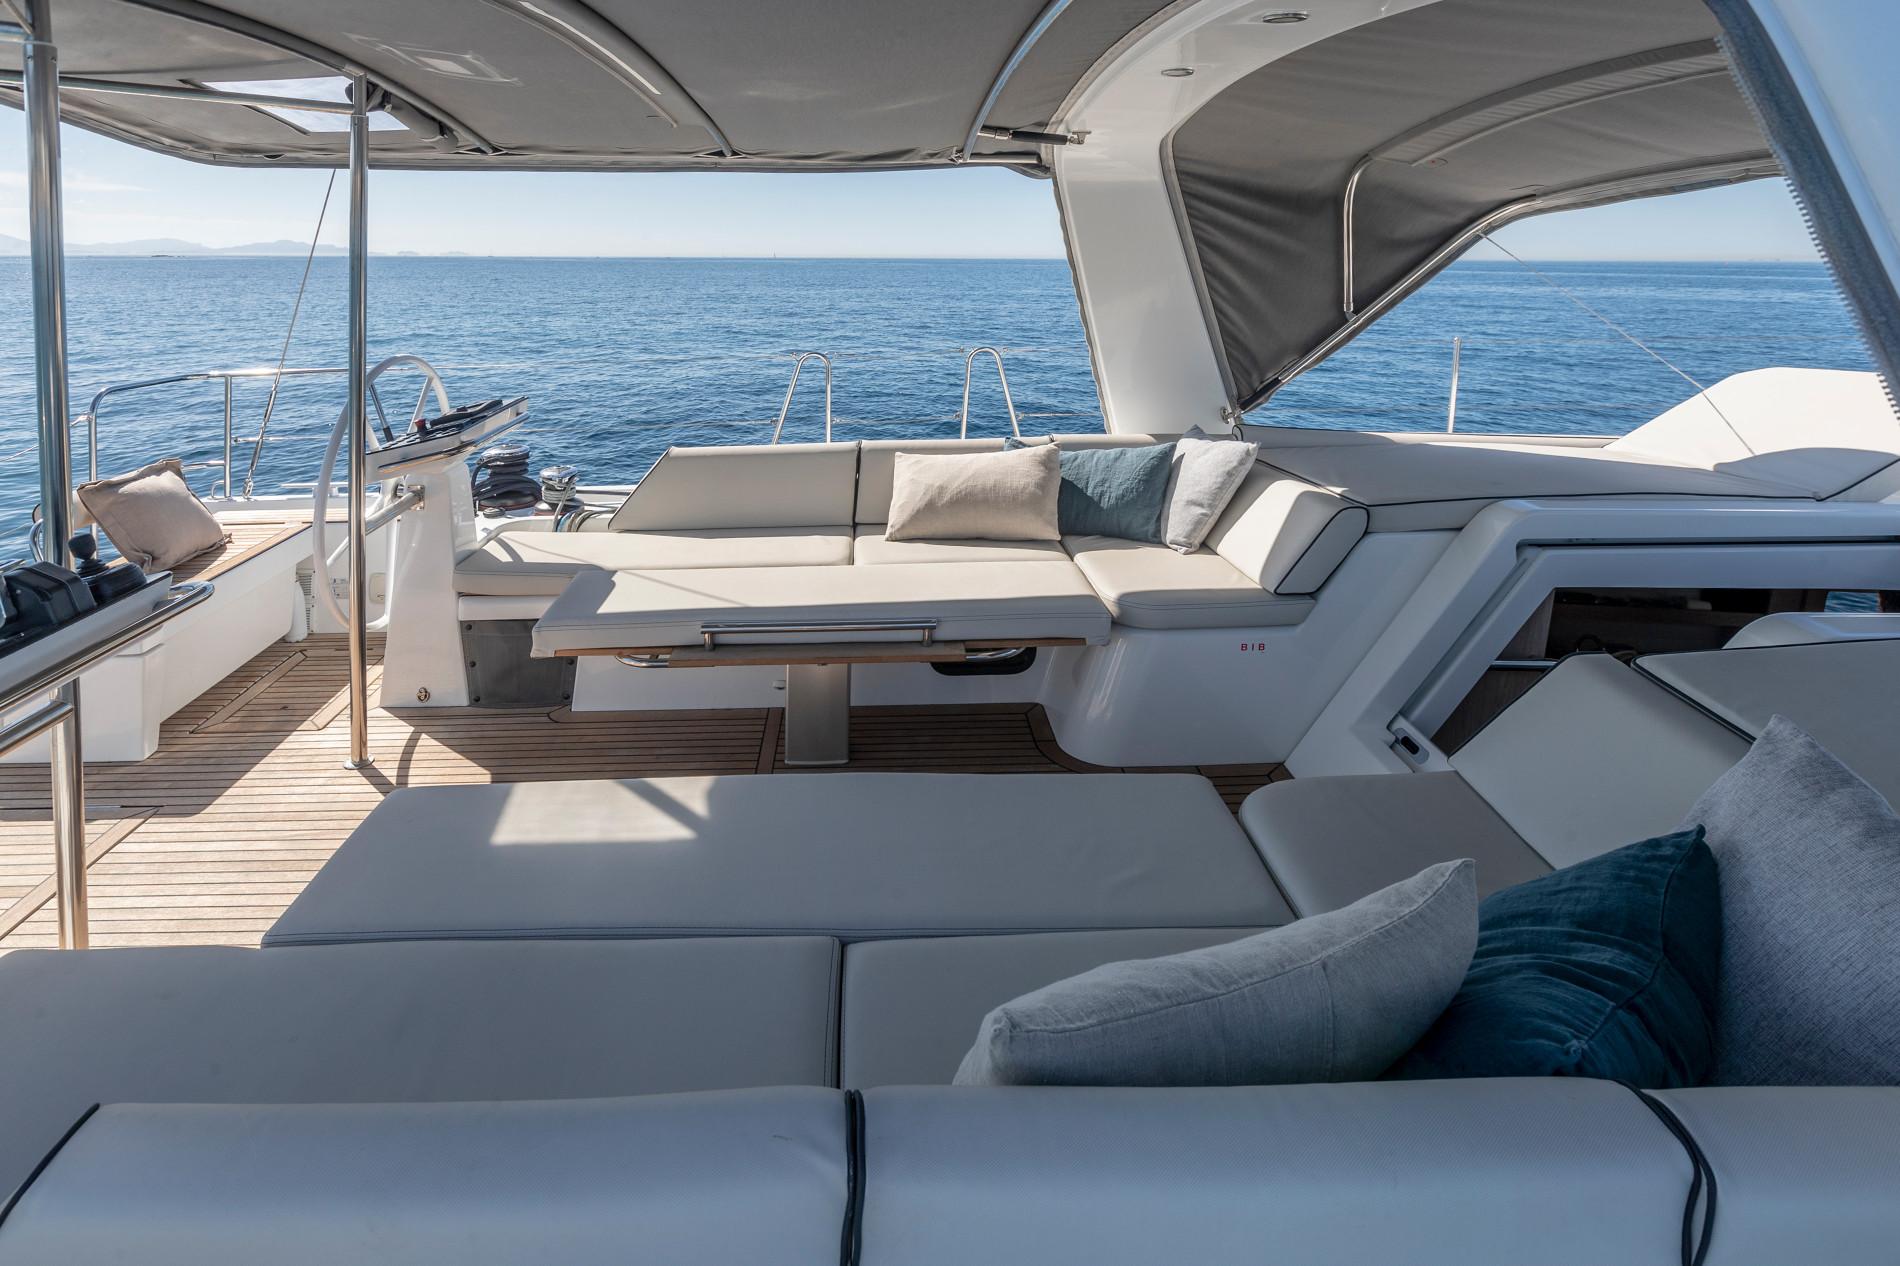 Beneteau Oceanis Yacht 54 — Exterior